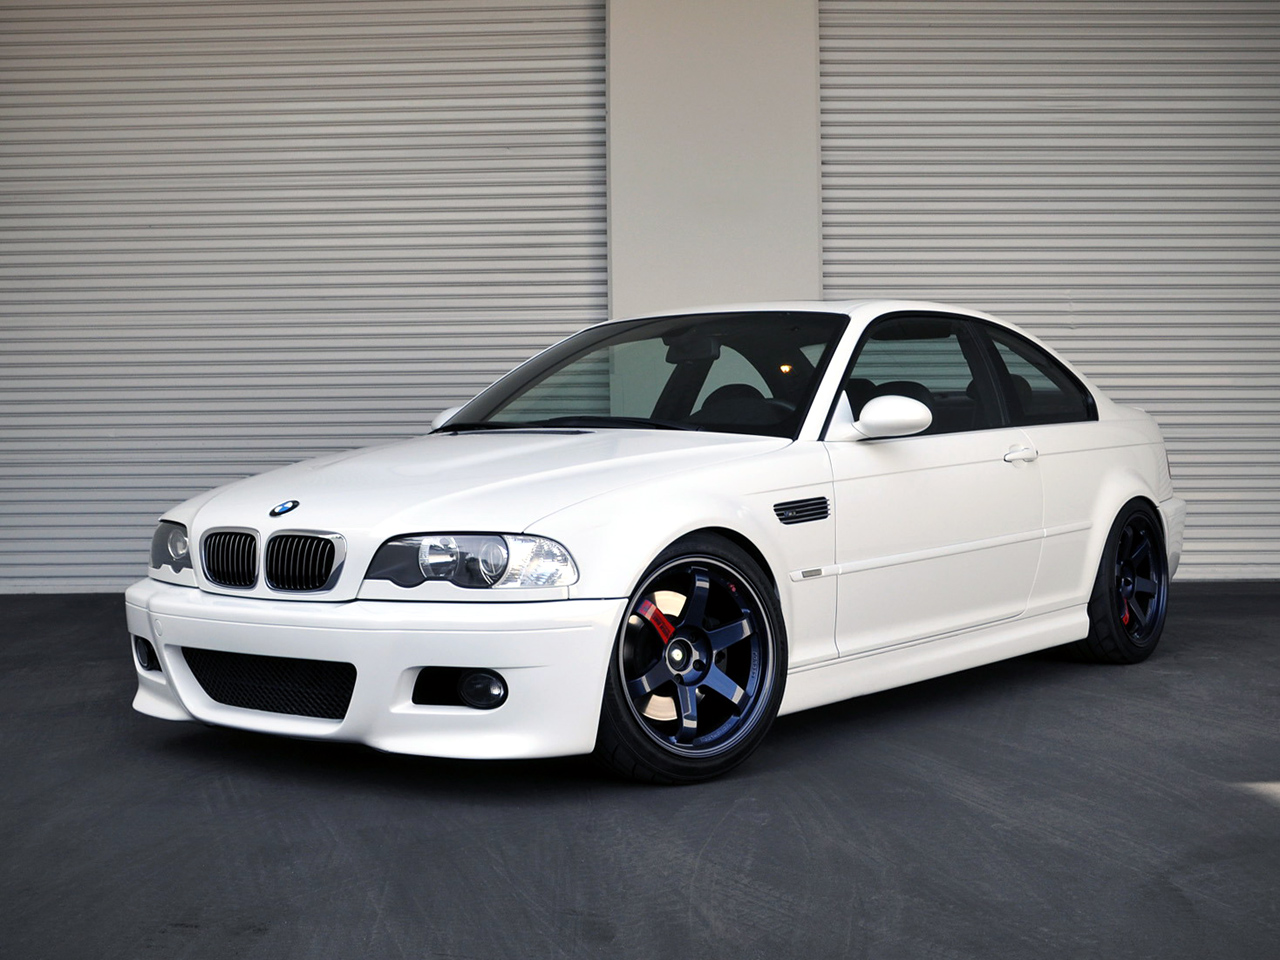 BMW M3 E46 Tuning Bmw M3 Wallpaper 1280x960